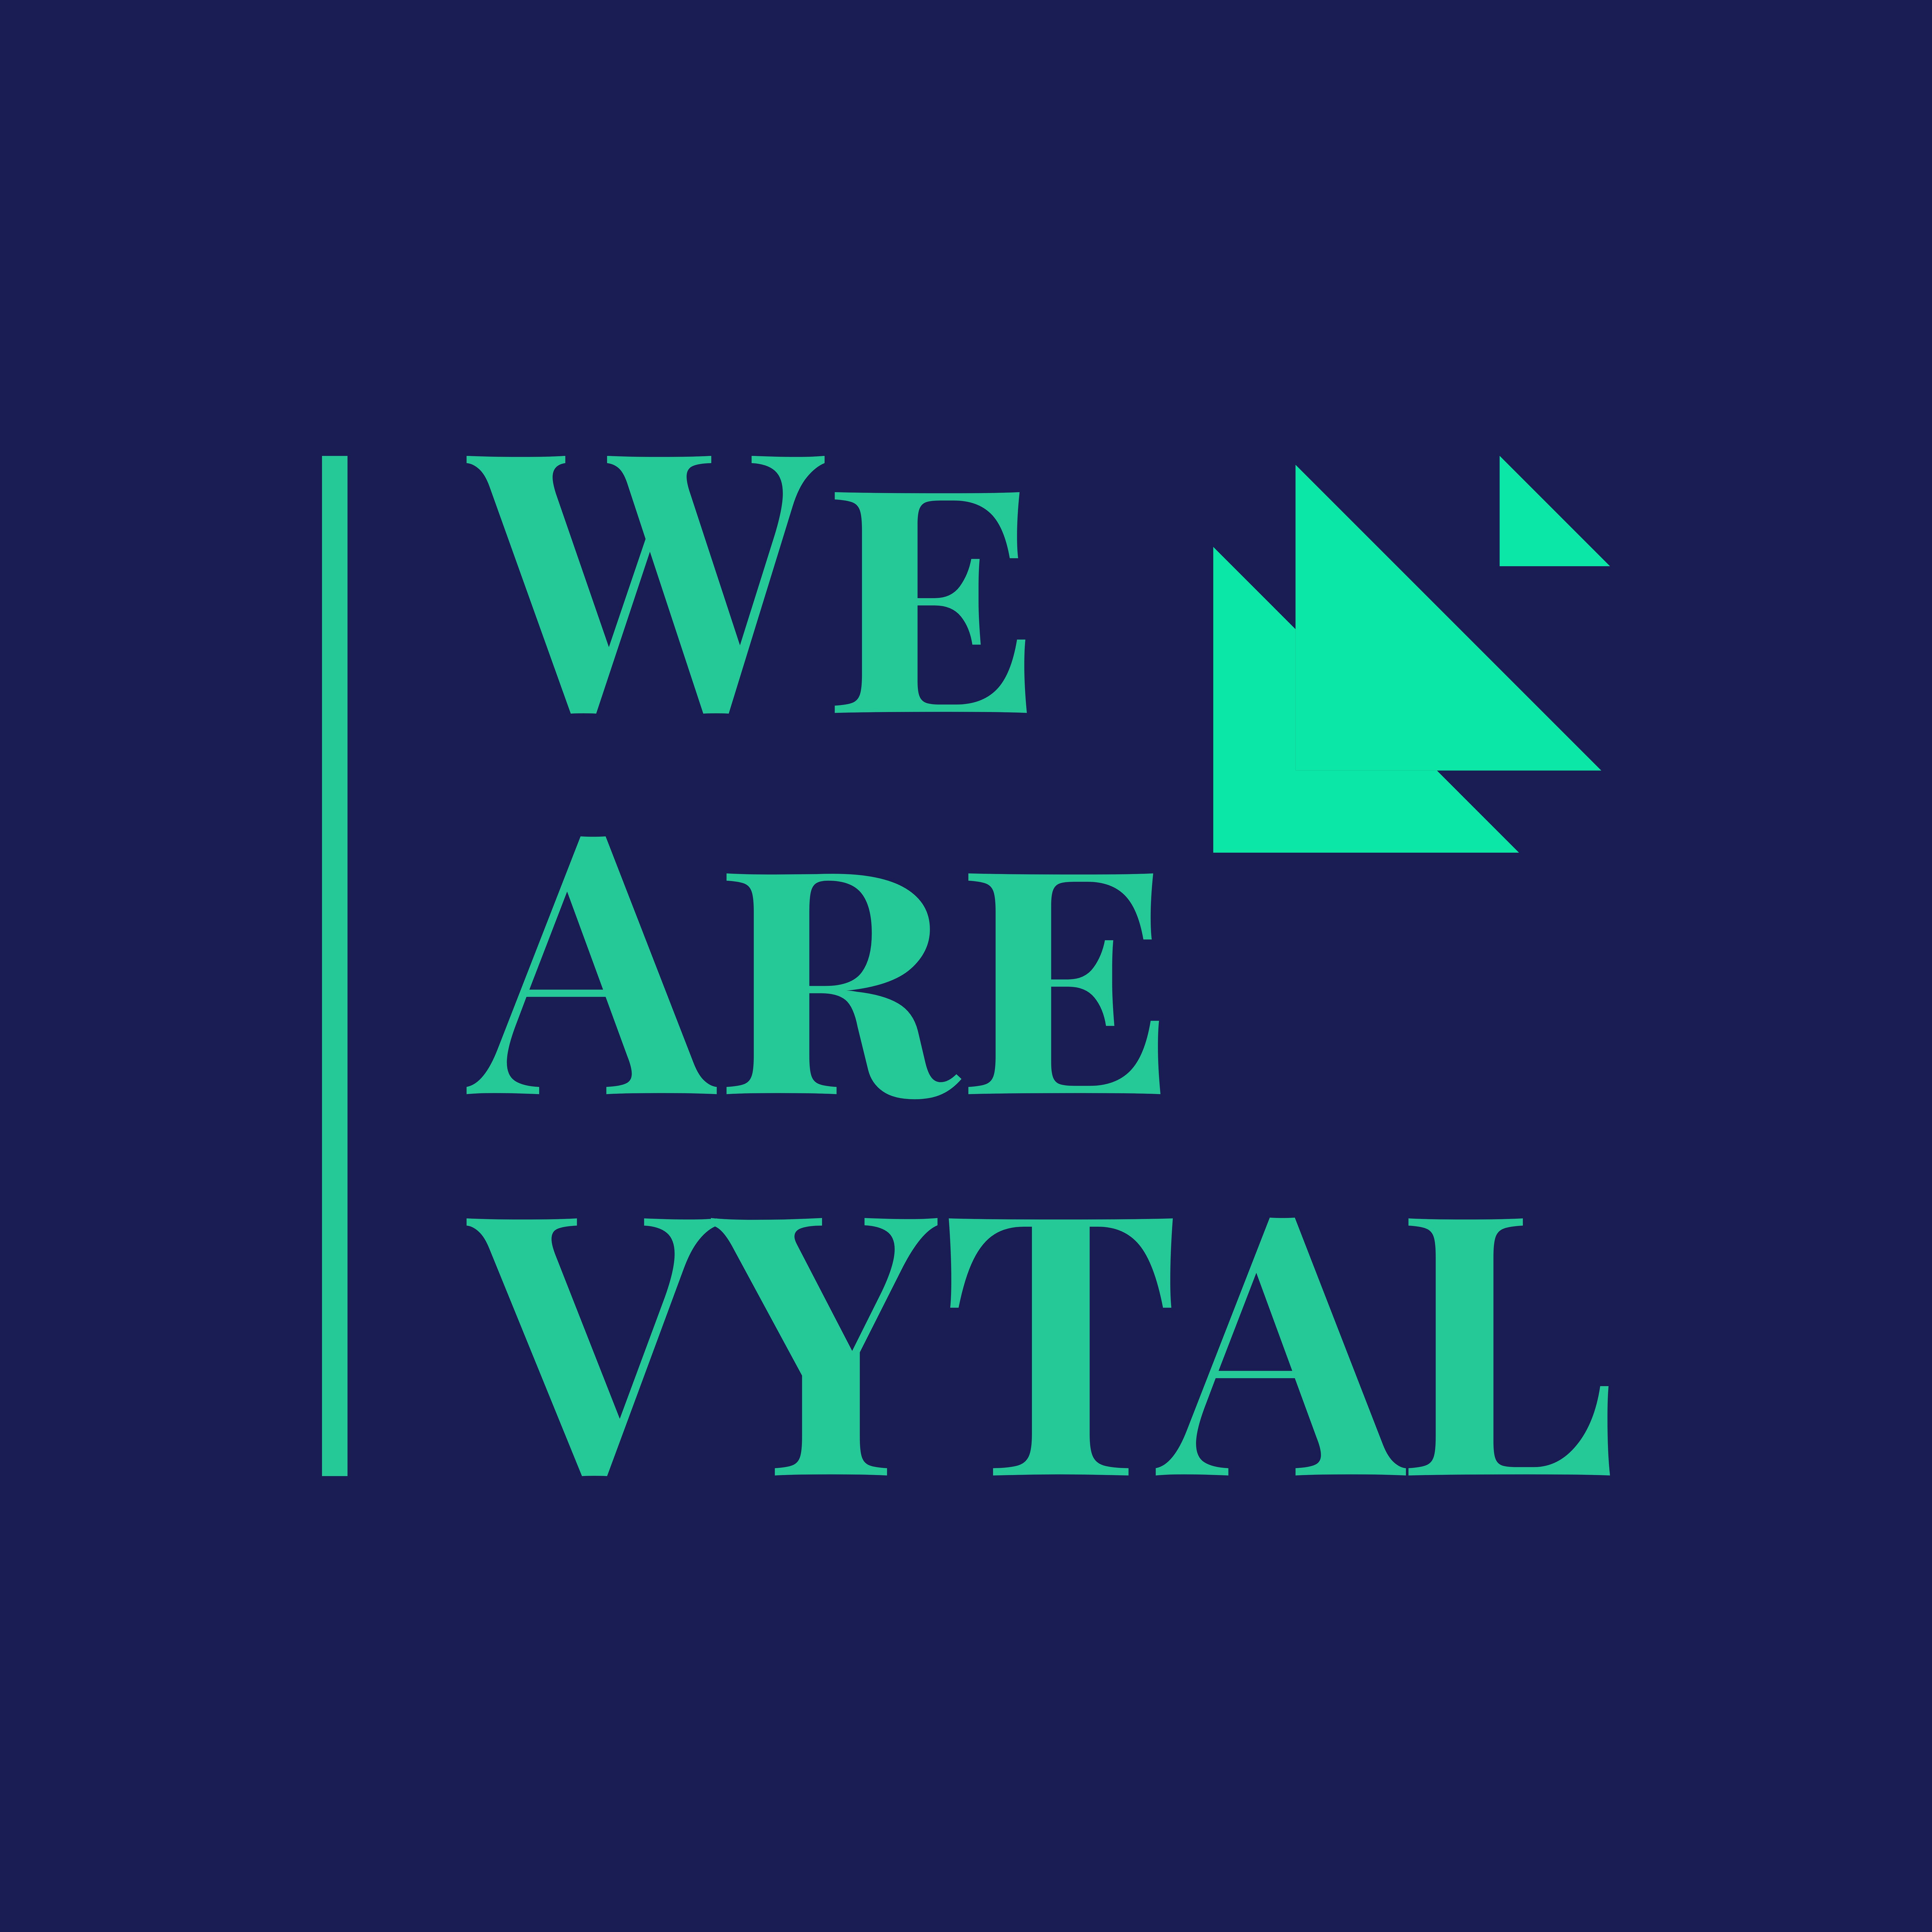 VYTAL LIFESTYLE + FITNESS blog